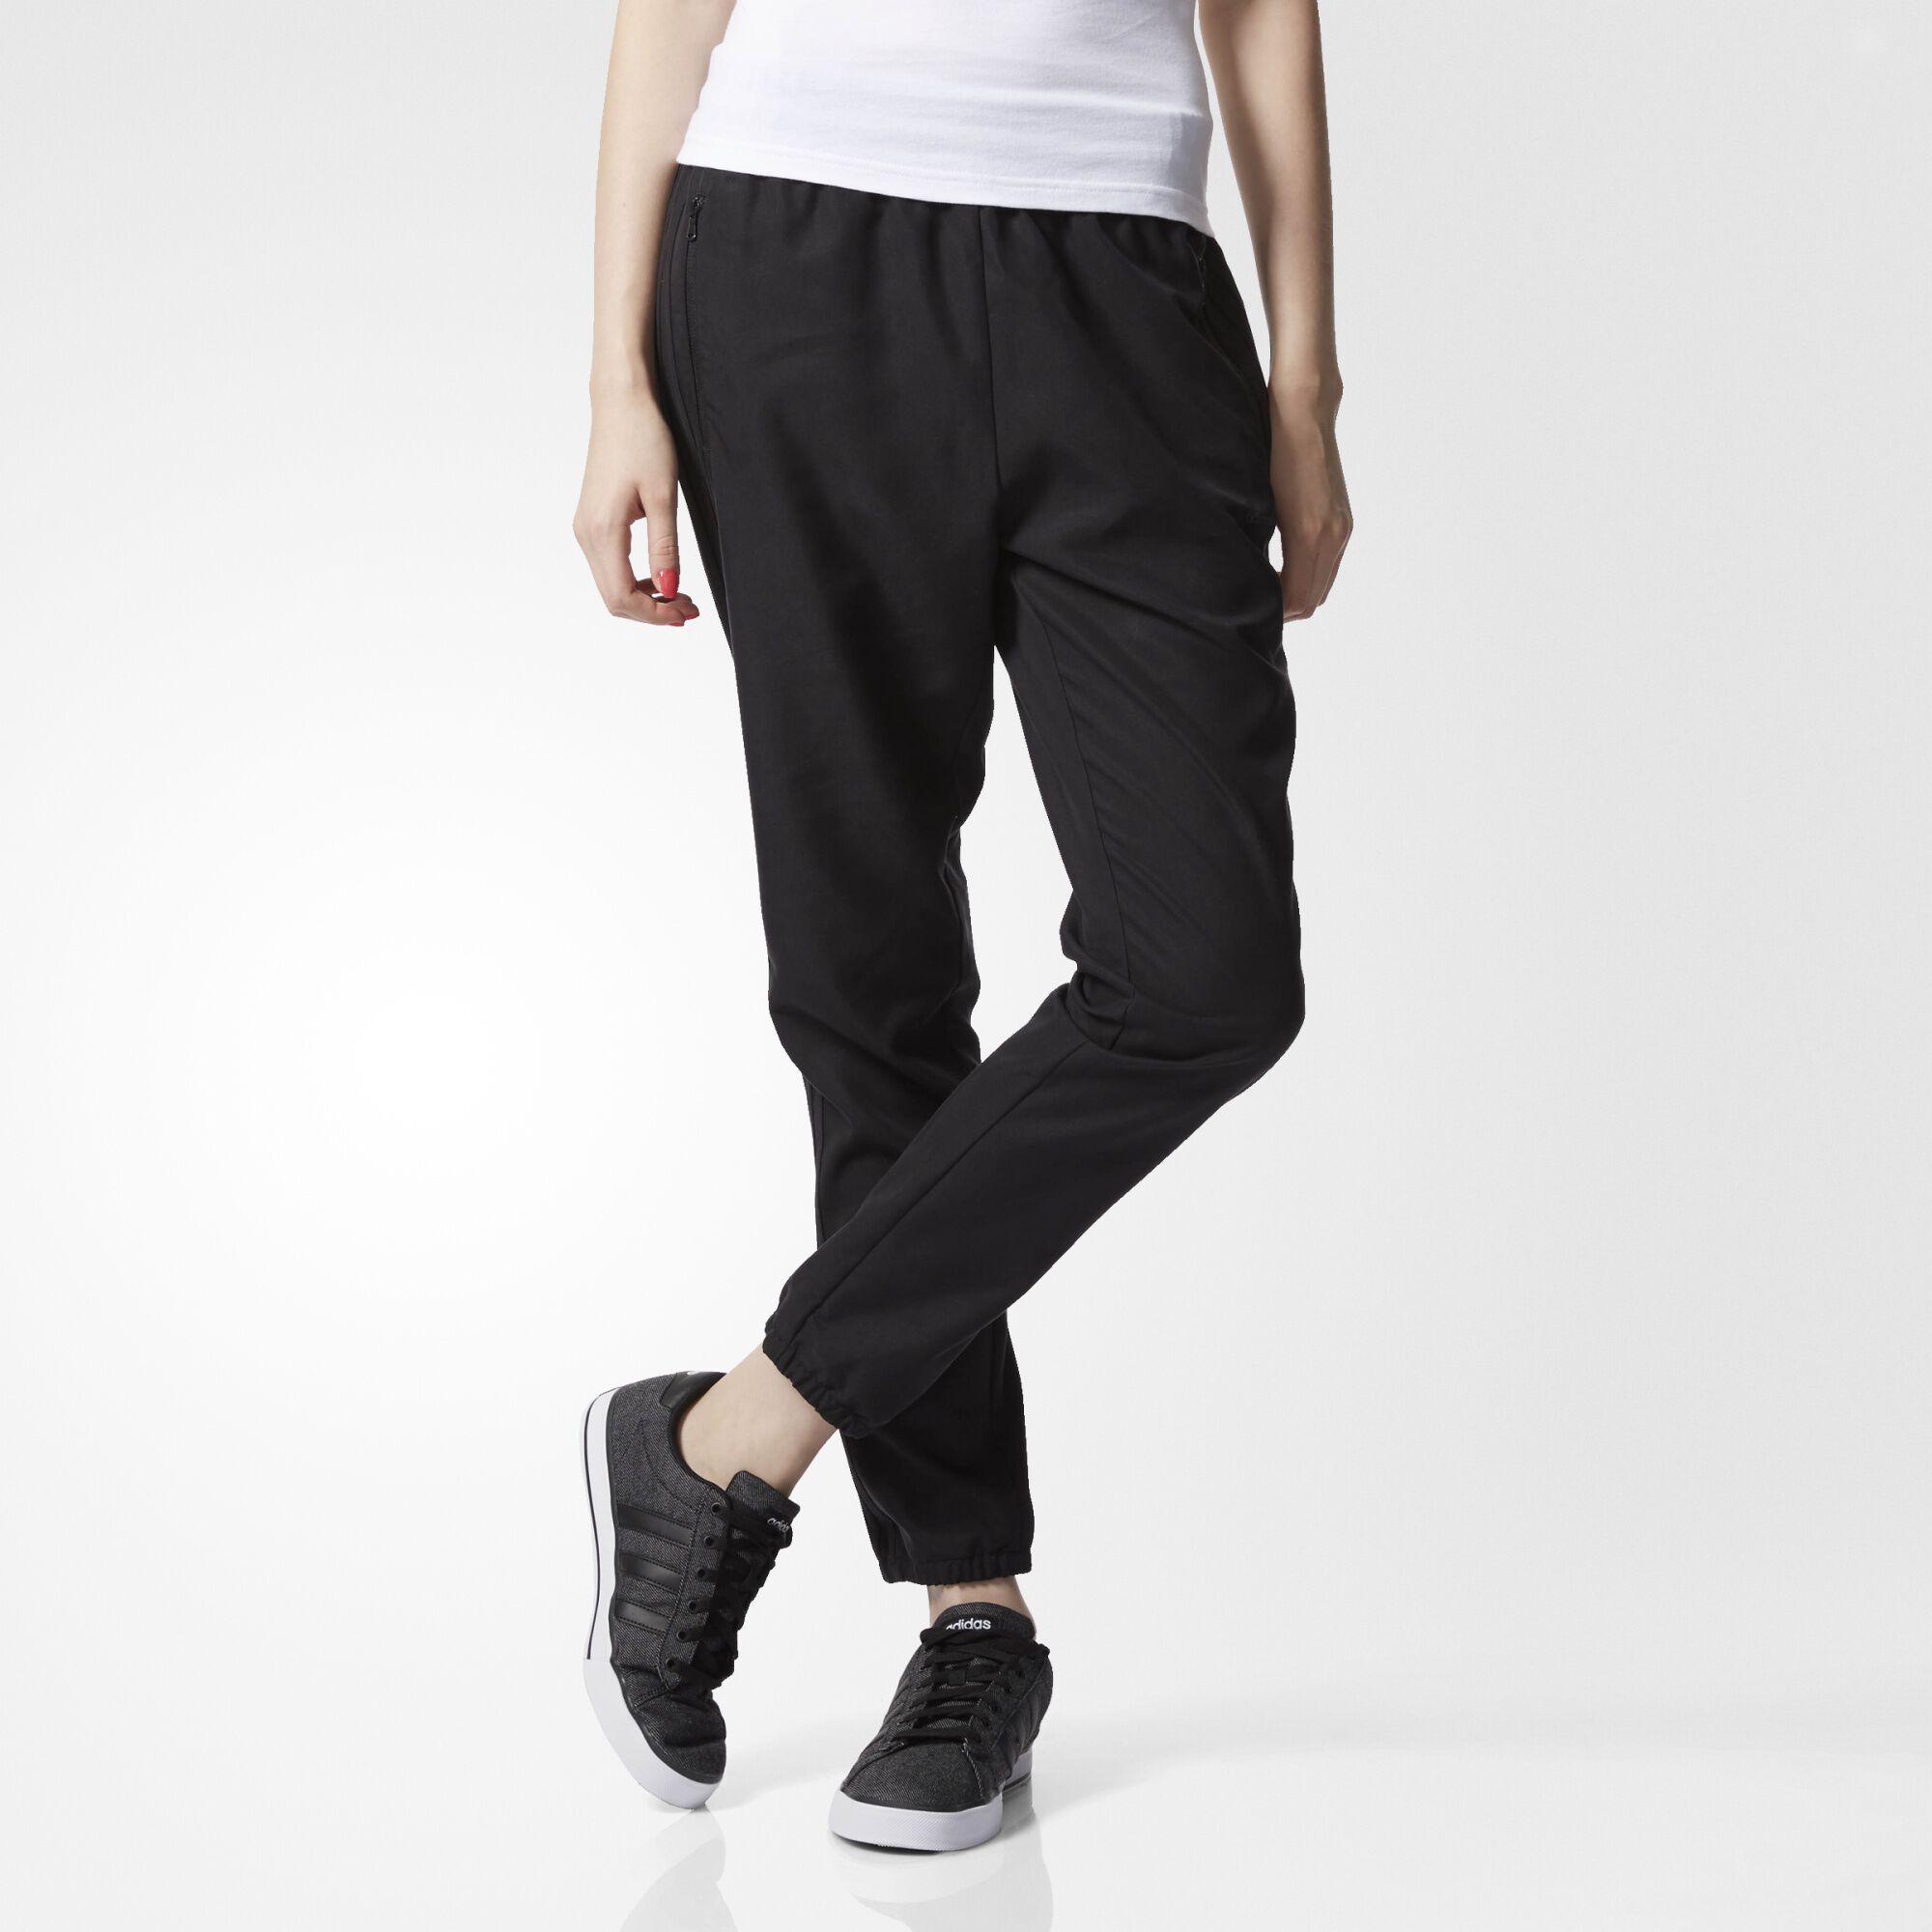 Unique Adidas Women Black Yoga Track Pants  S04776  Price In India